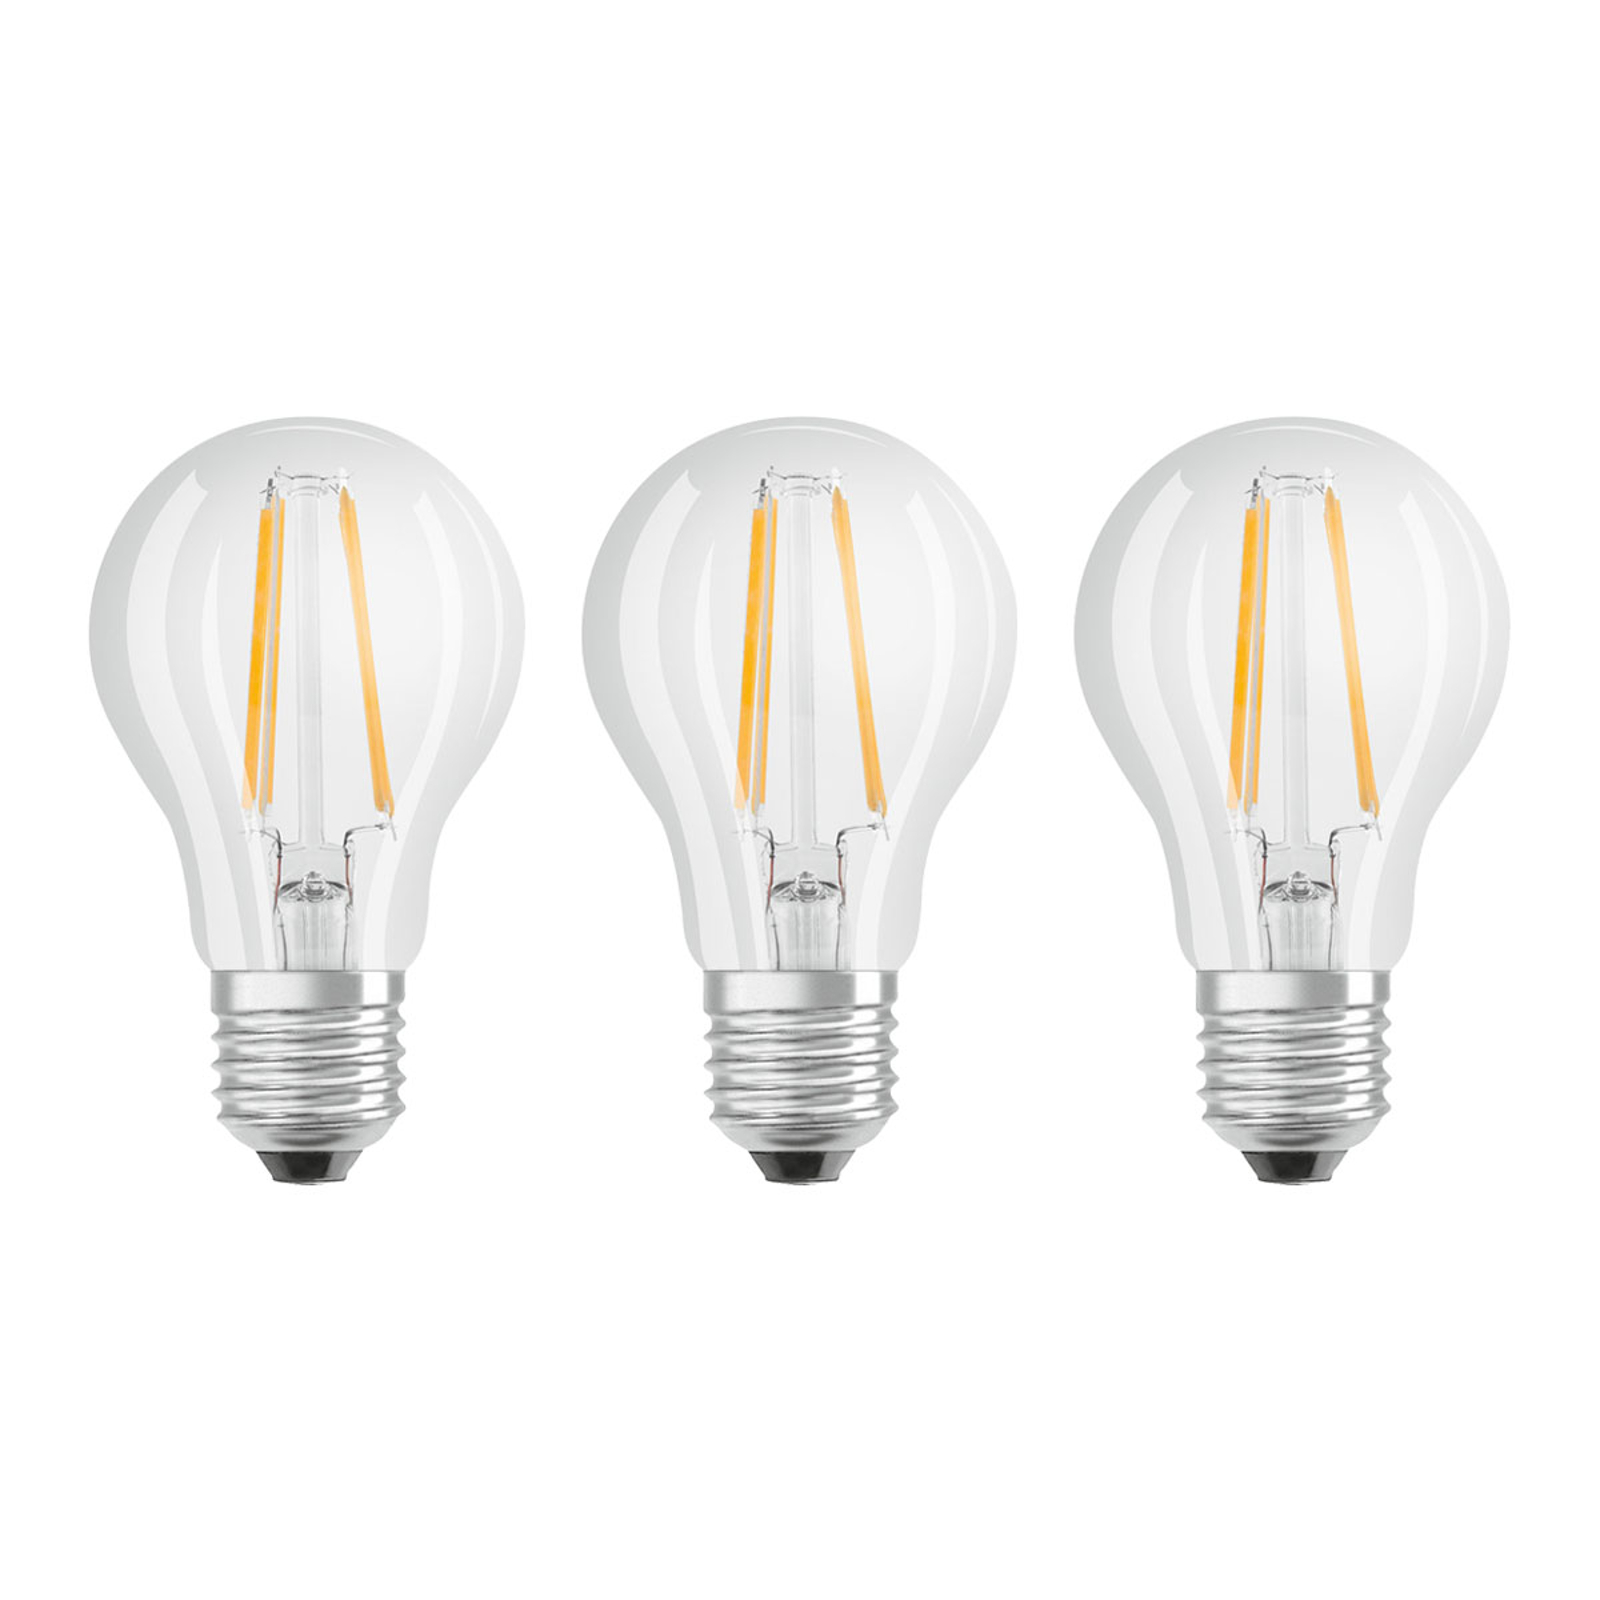 OSRAM LED-Lampe E27 Classic Fil. 840 7W klar 3er